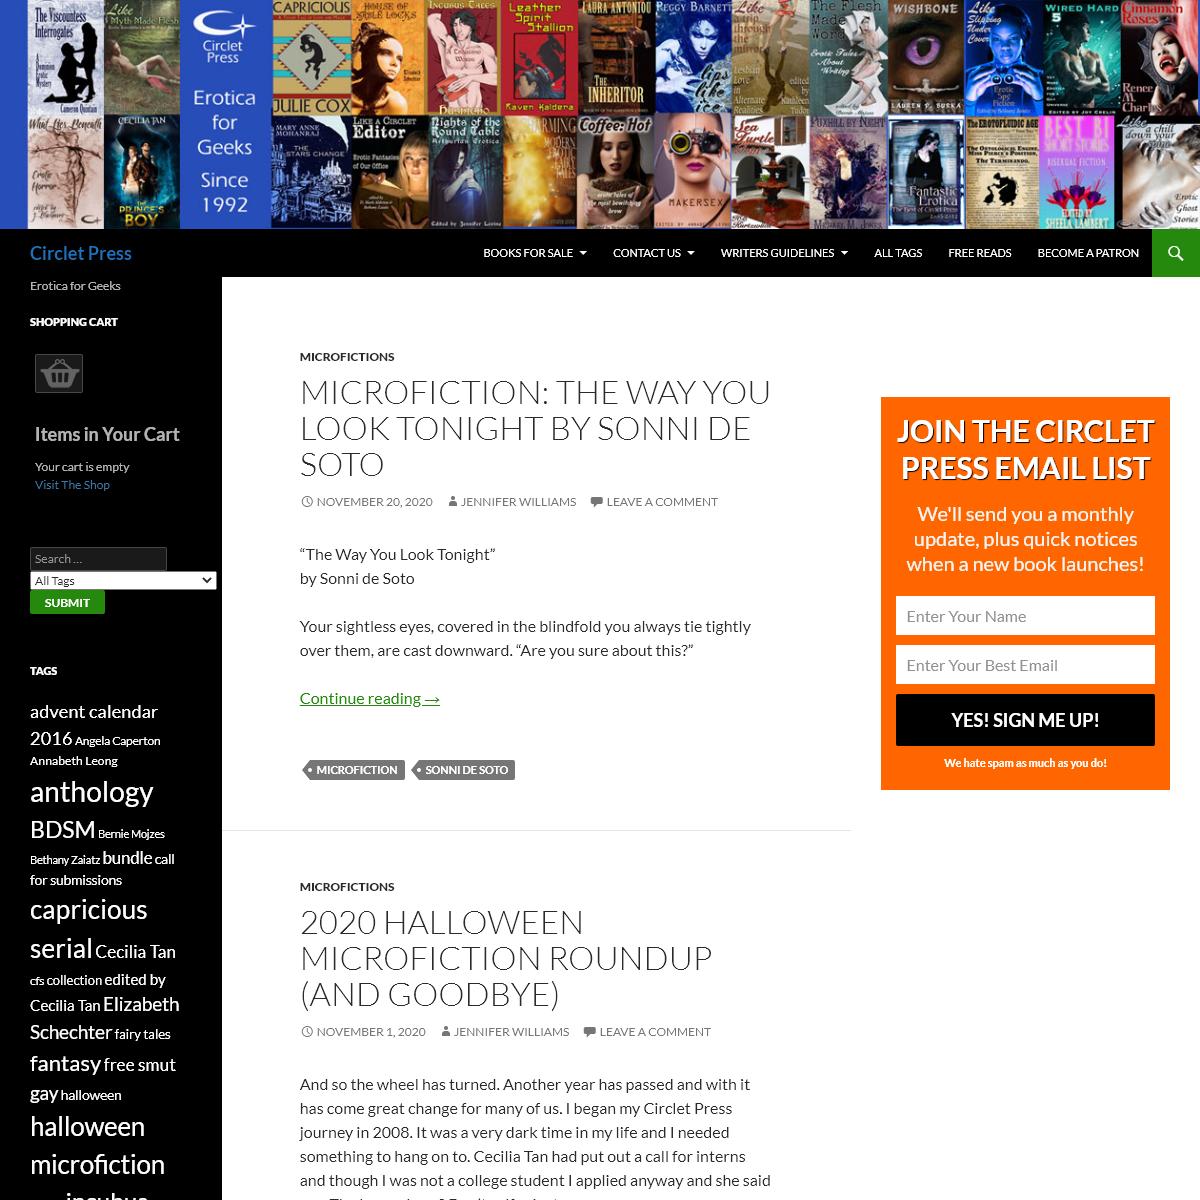 Circlet Press - Erotica for Geeks